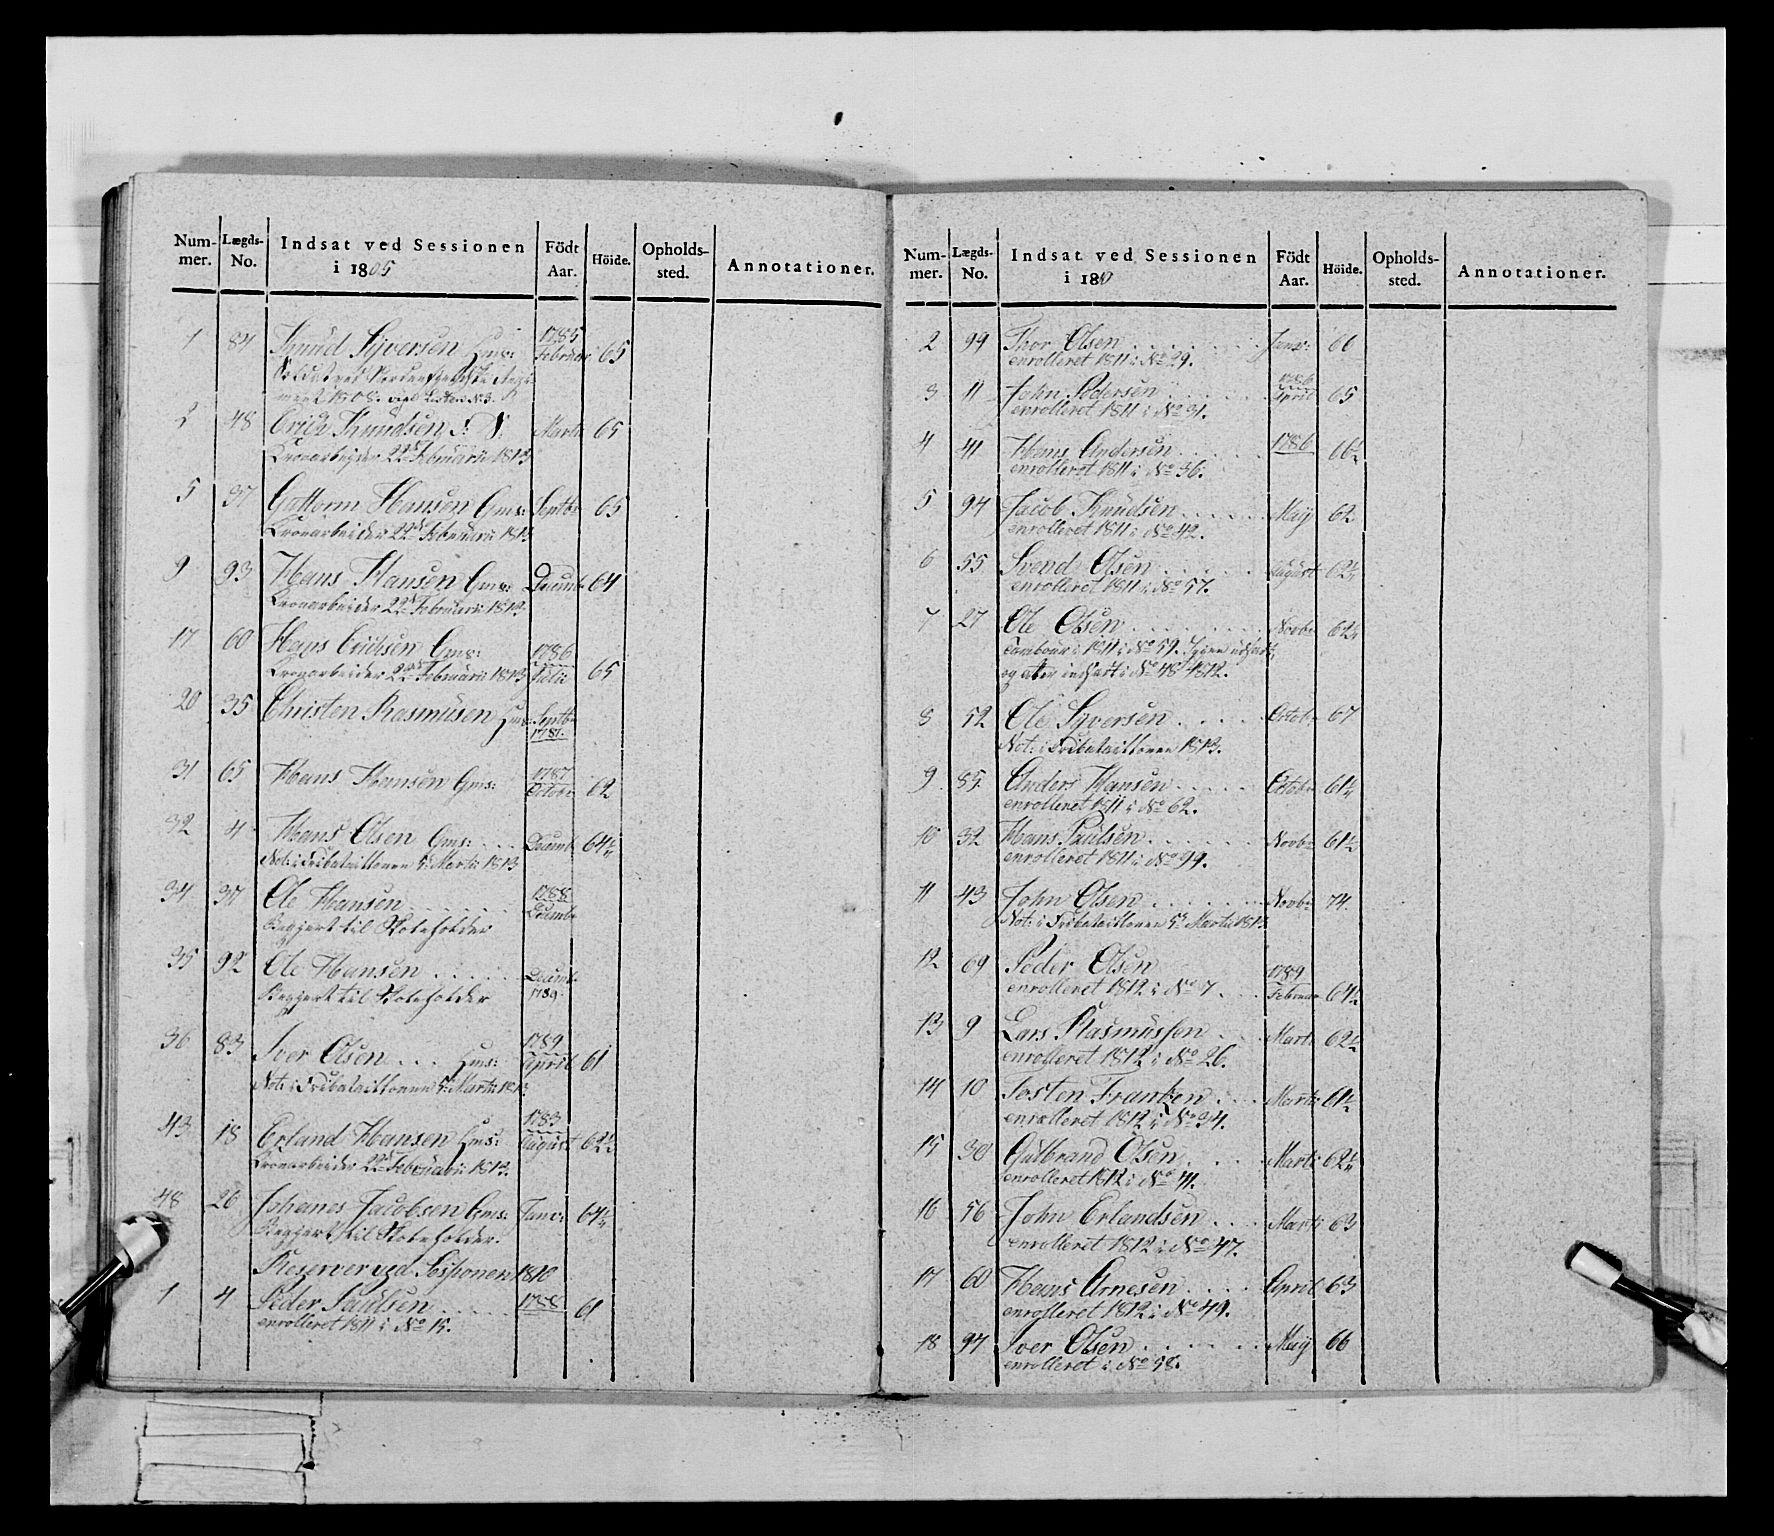 RA, Generalitets- og kommissariatskollegiet, Det kongelige norske kommissariatskollegium, E/Eh/L0069: Opplandske gevorbne infanteriregiment, 1810-1818, s. 506